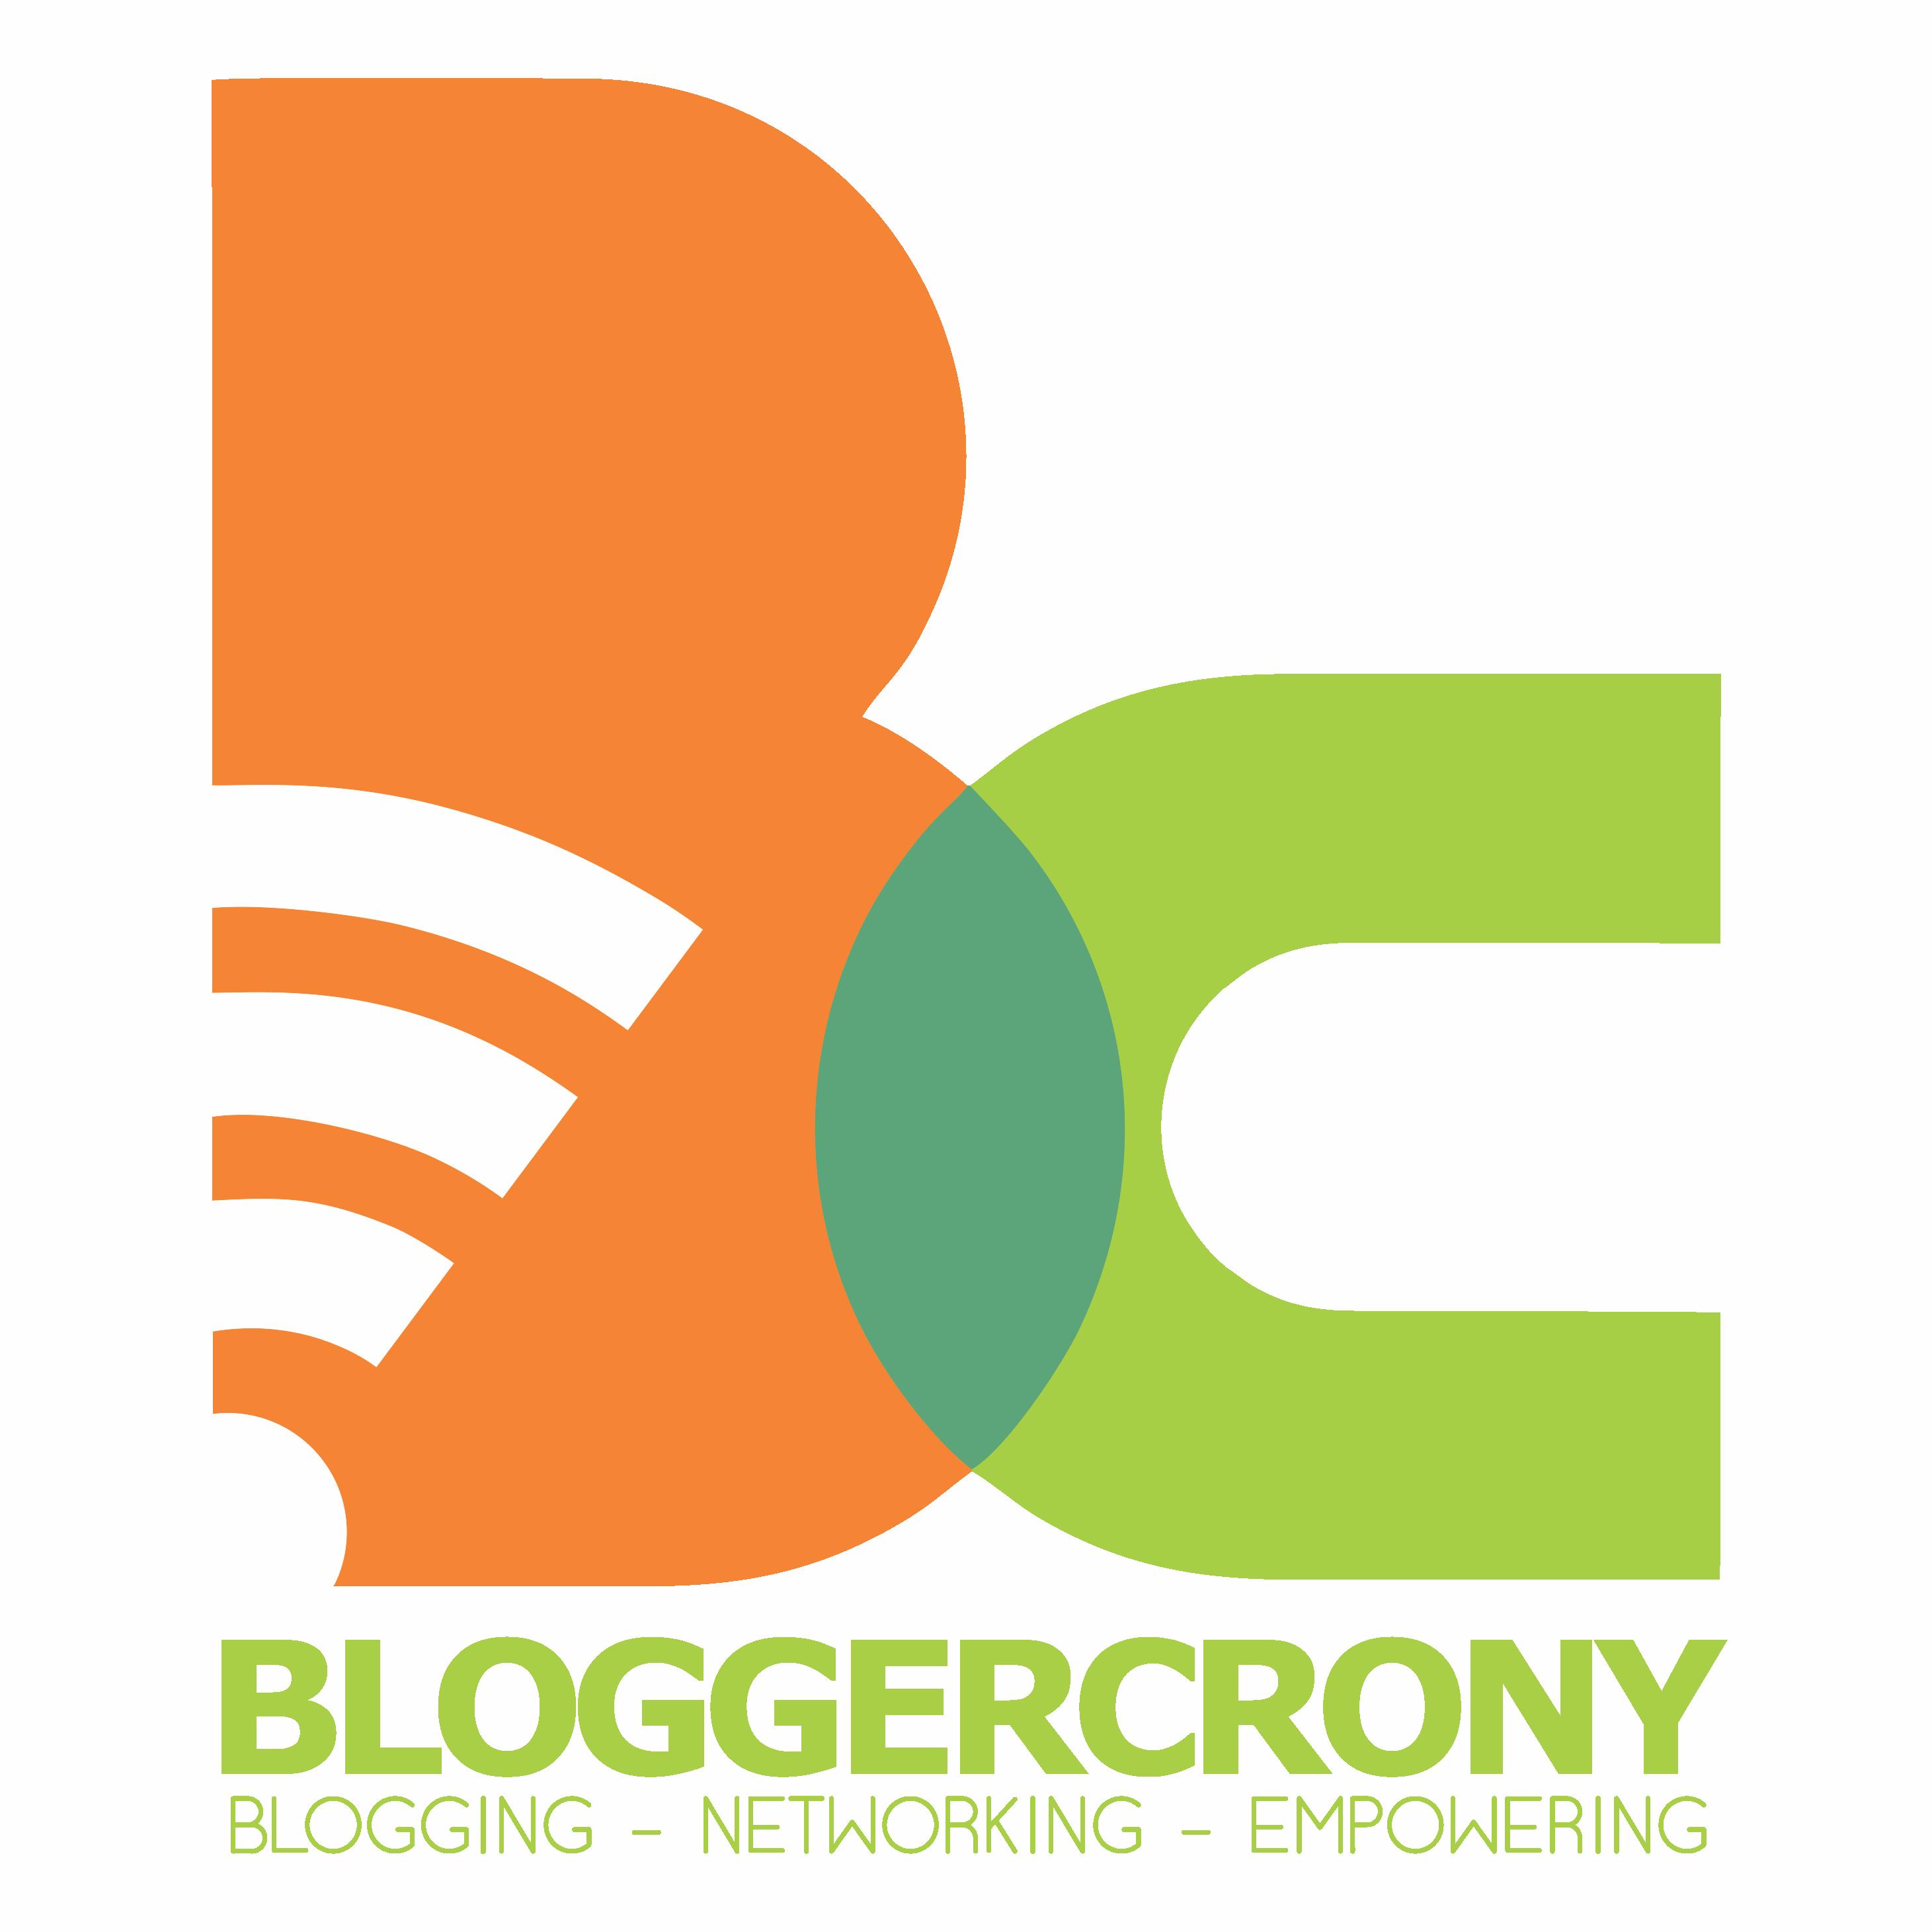 Blogger Cronny